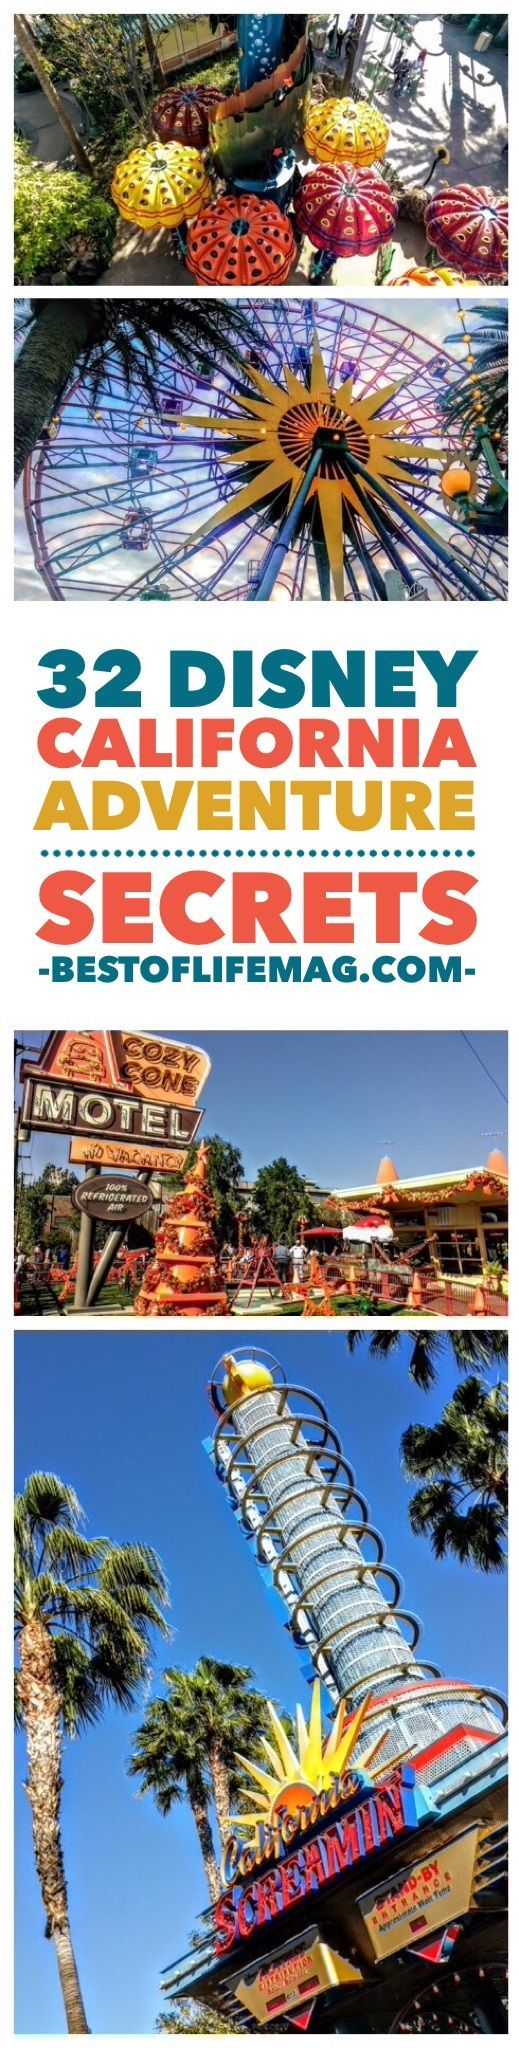 32 California Adventure Secrets at Disneyland Resort - The Best of Life Magazine